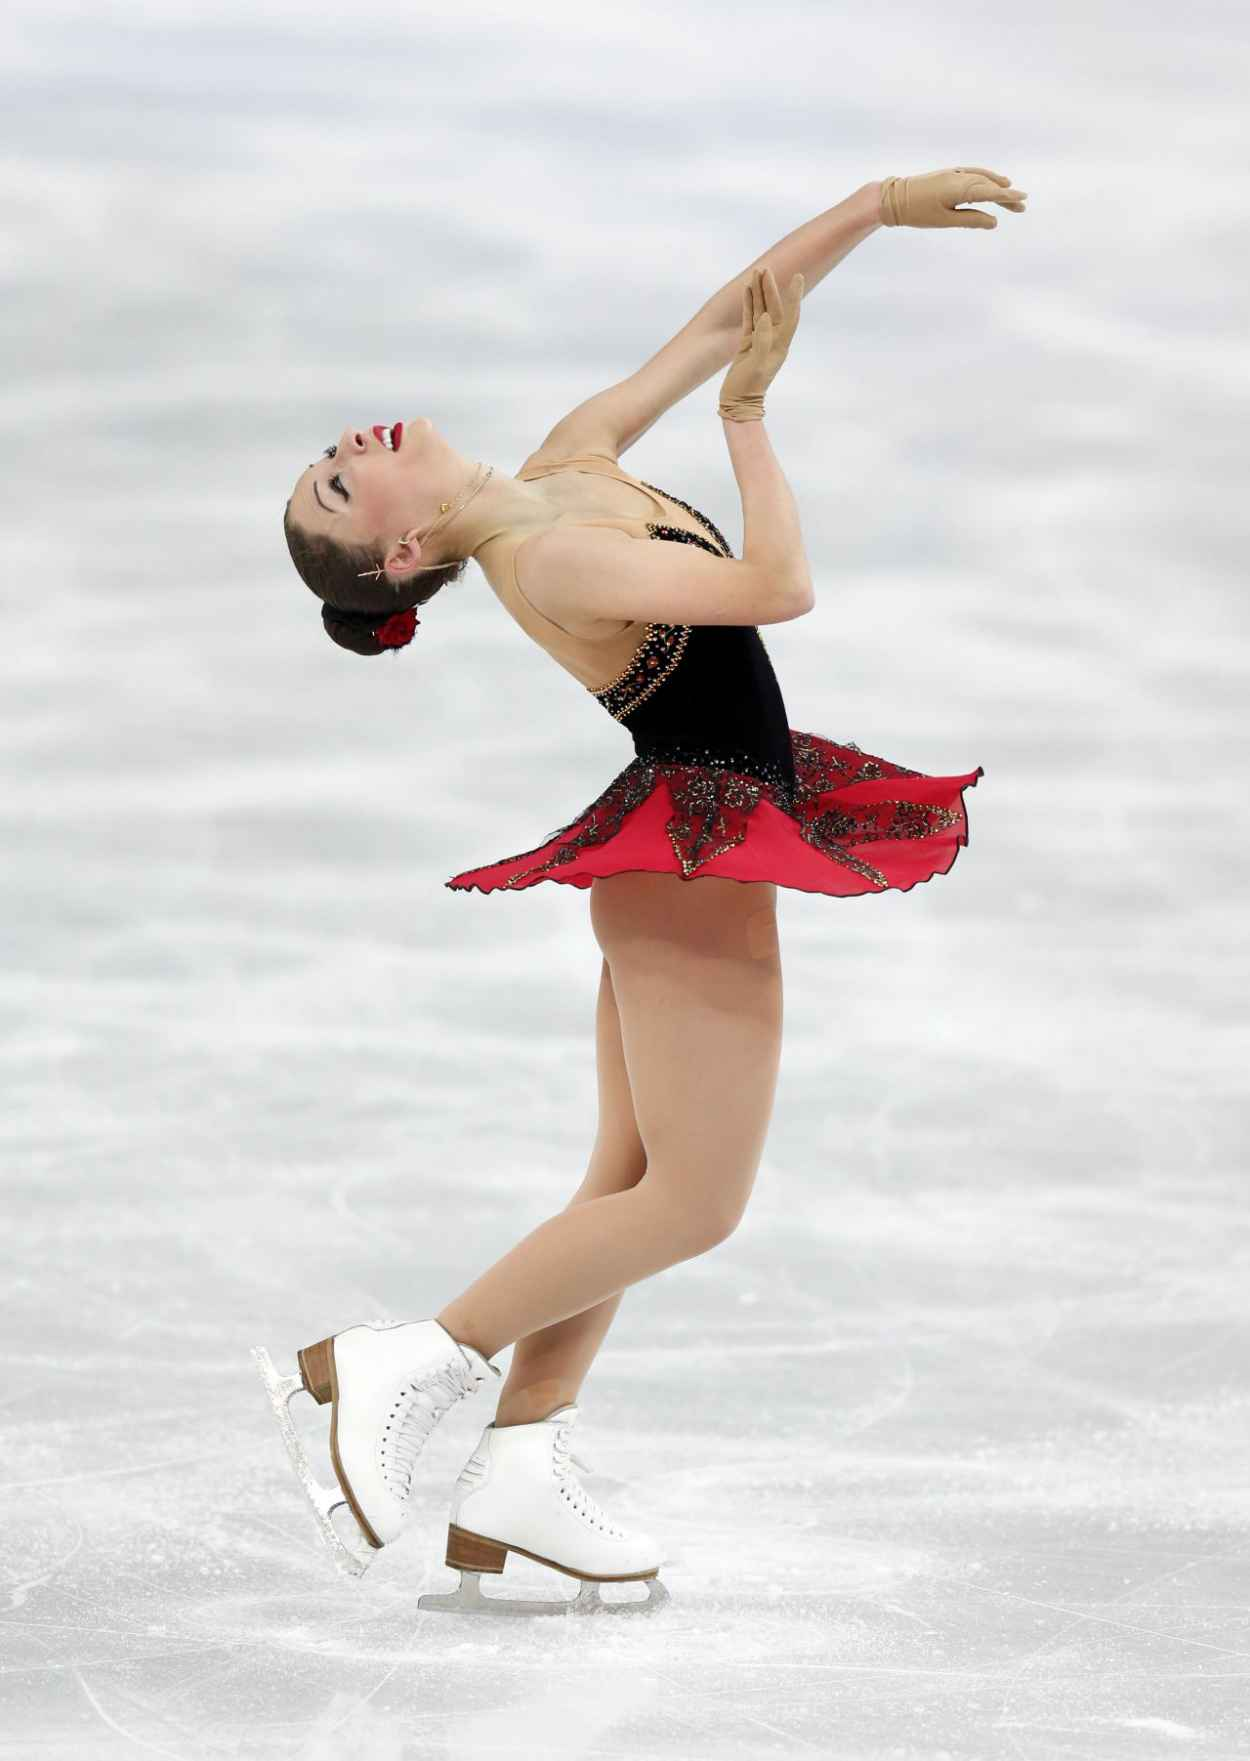 Elene Gedevanishvili - Women-s Figure Skating Free Program - 2015 Sochi Winter Olympics-1